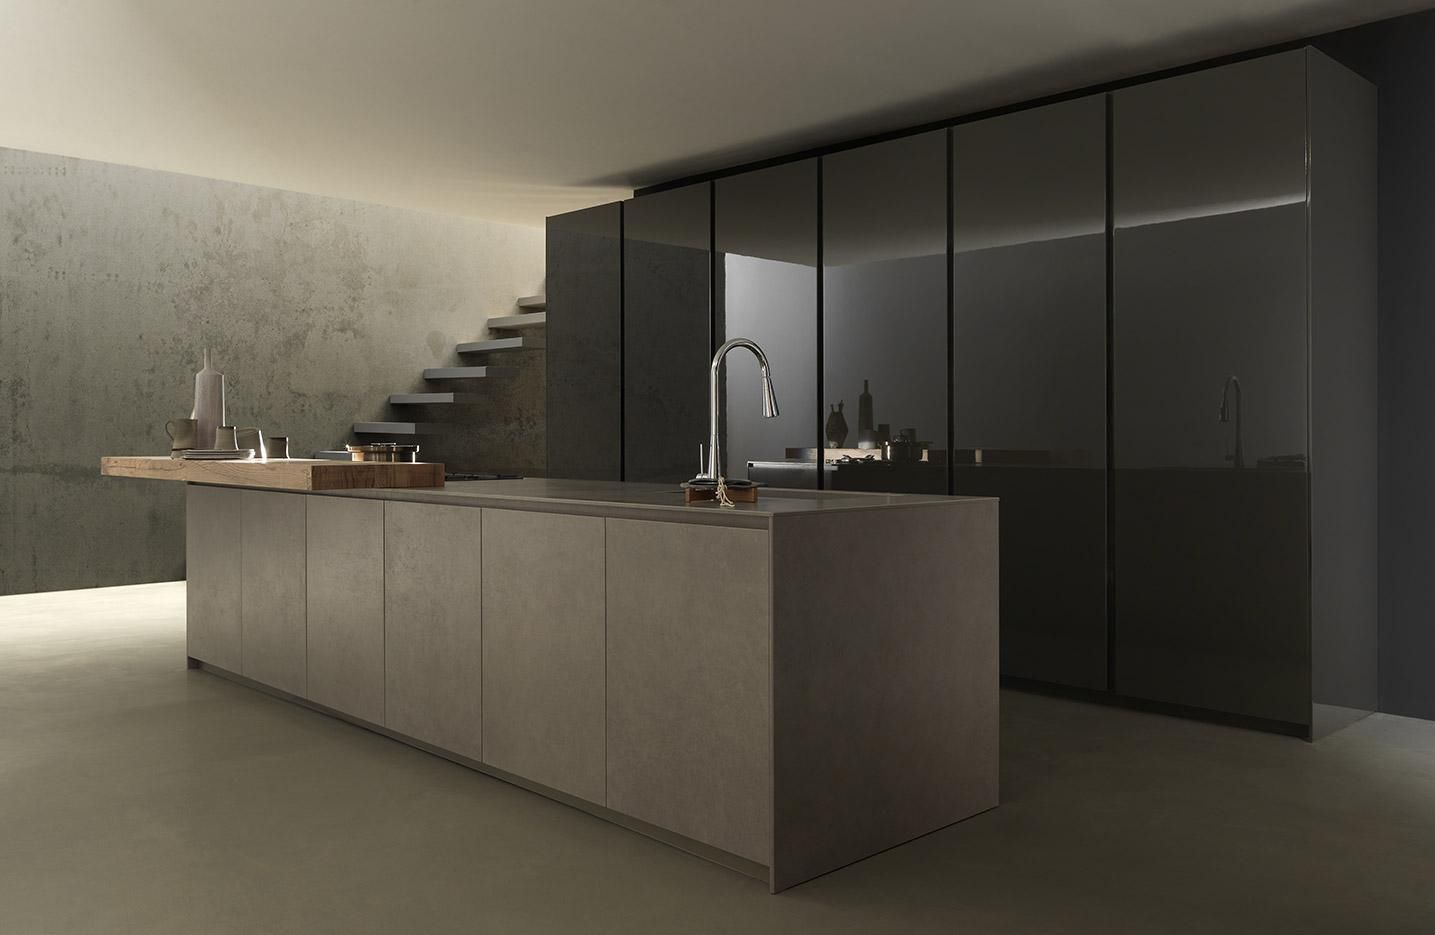 Moderne küchen mit insel holz  Moderne Küche / Holz / Kochinsel / matt - BLADE - MODULNOVA